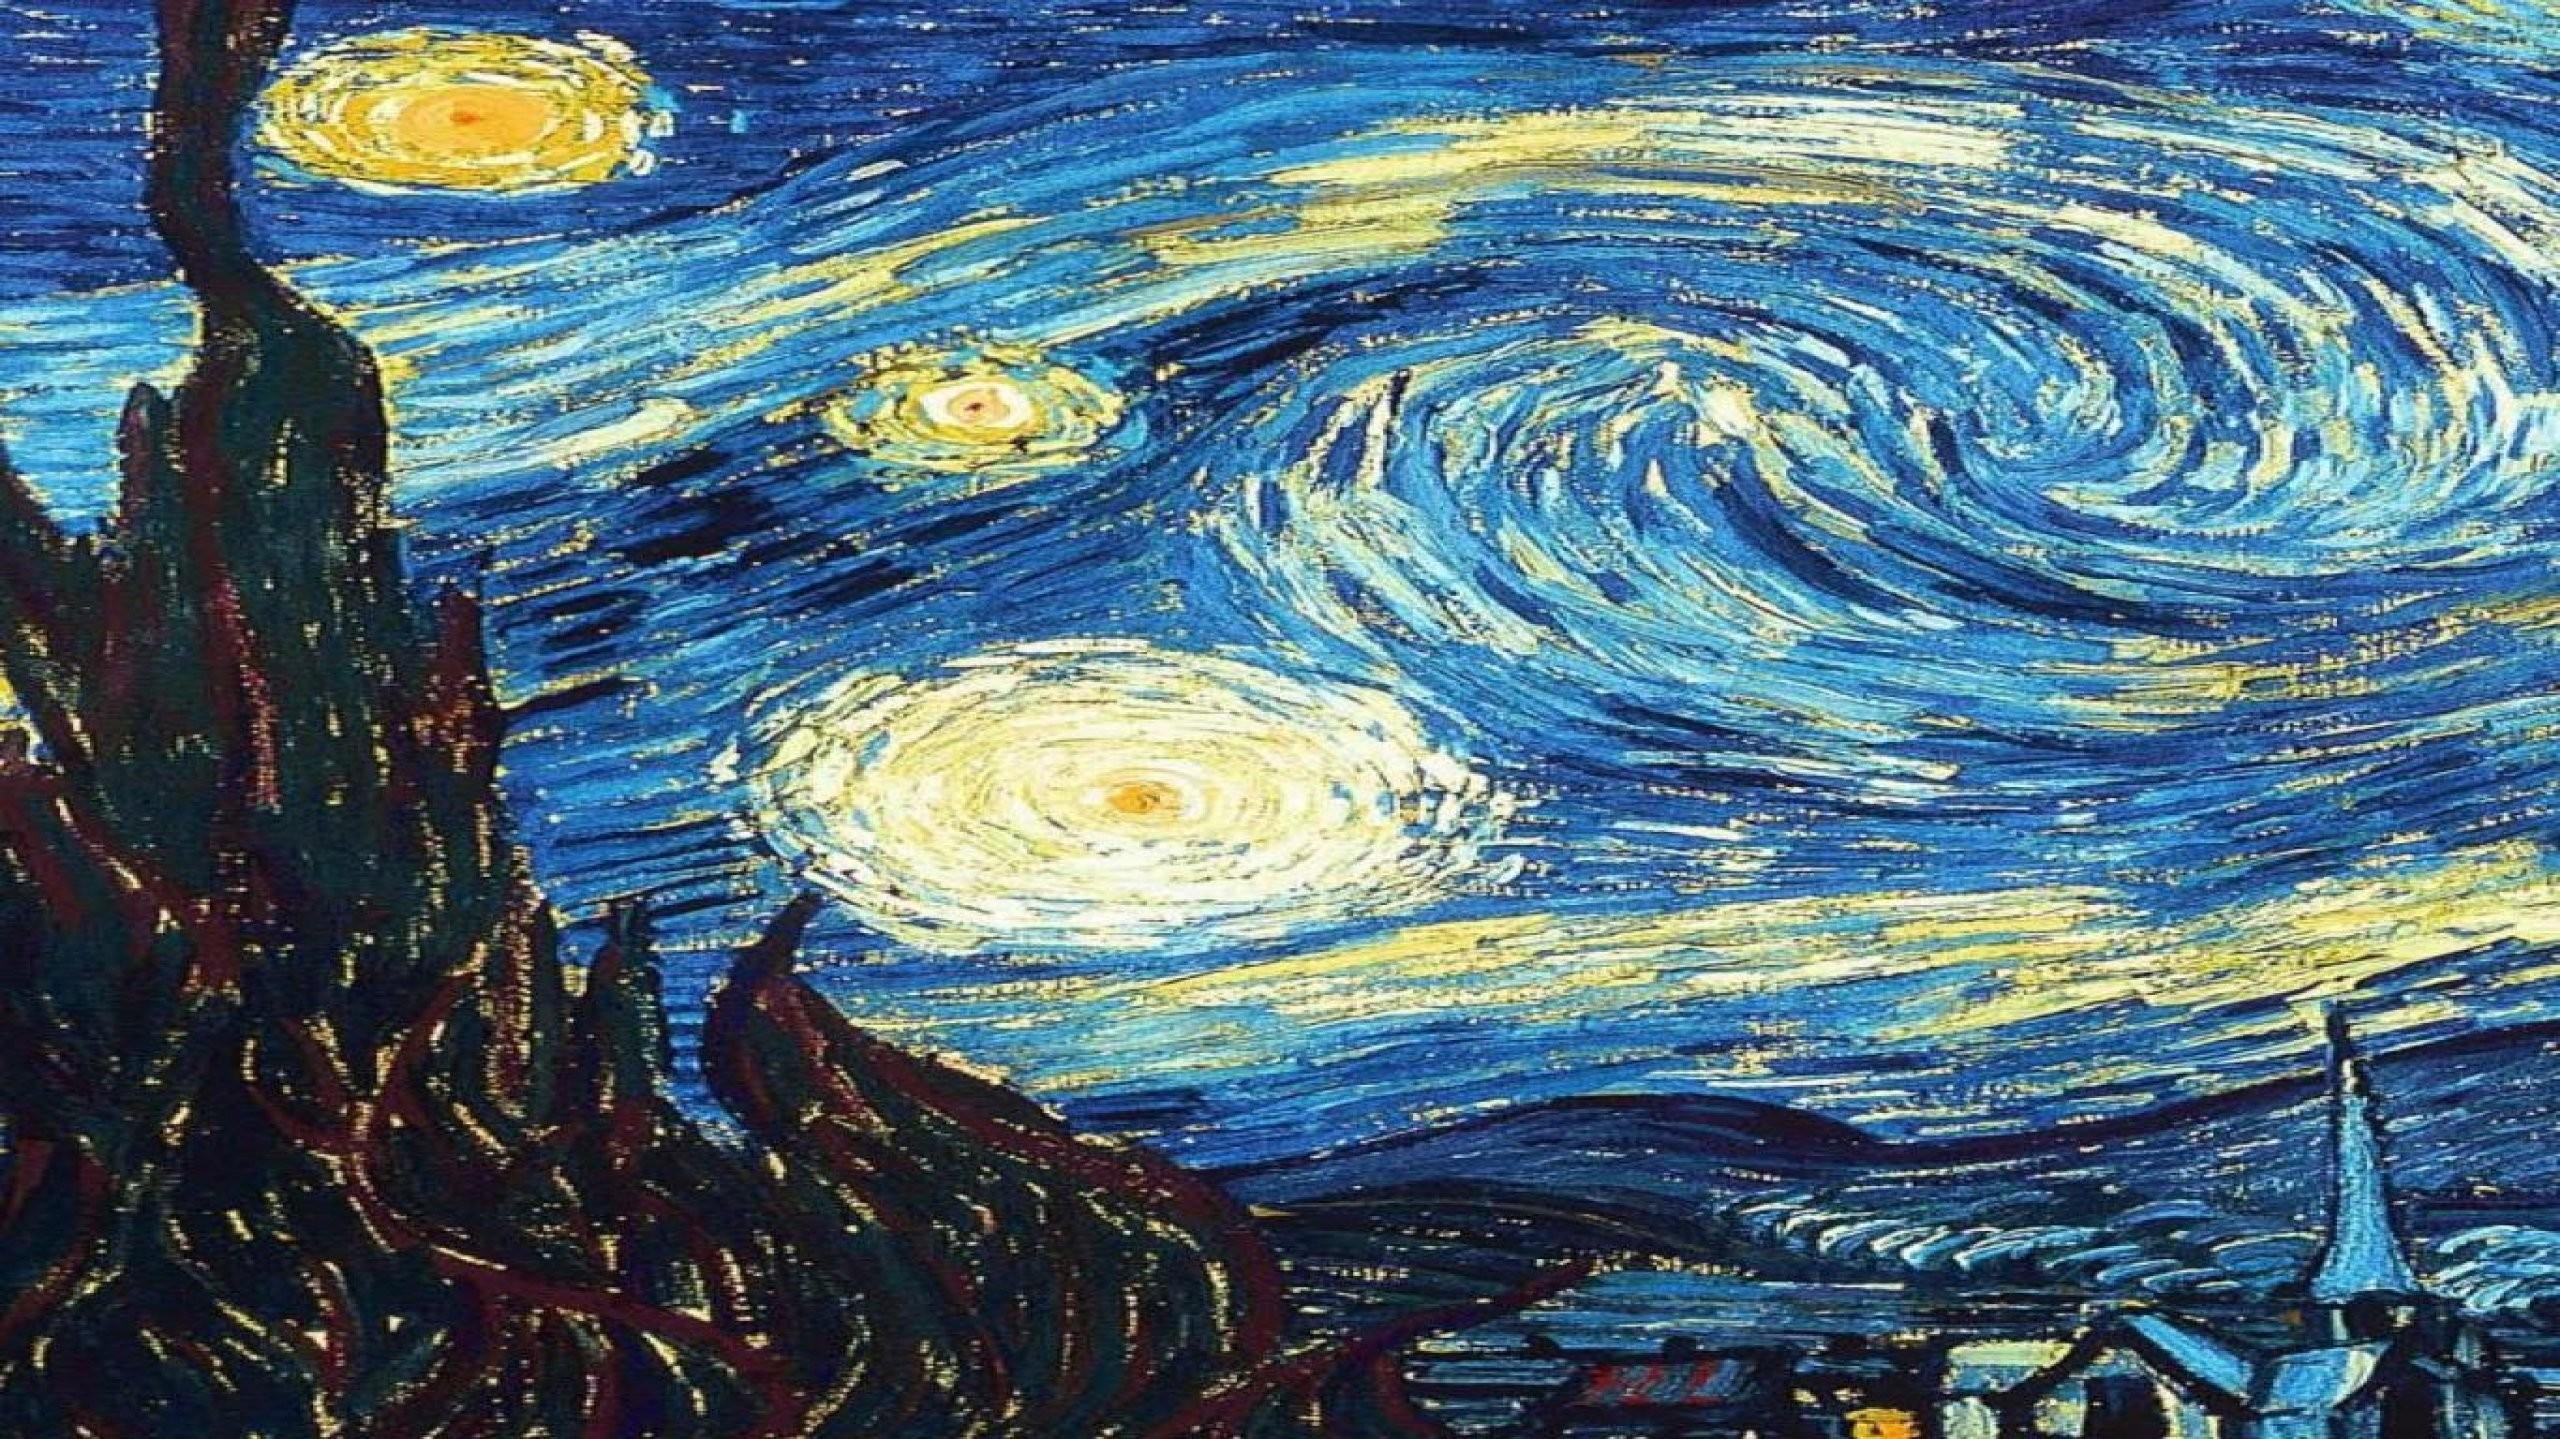 Van Gogh Starry Night Wallpapers 16